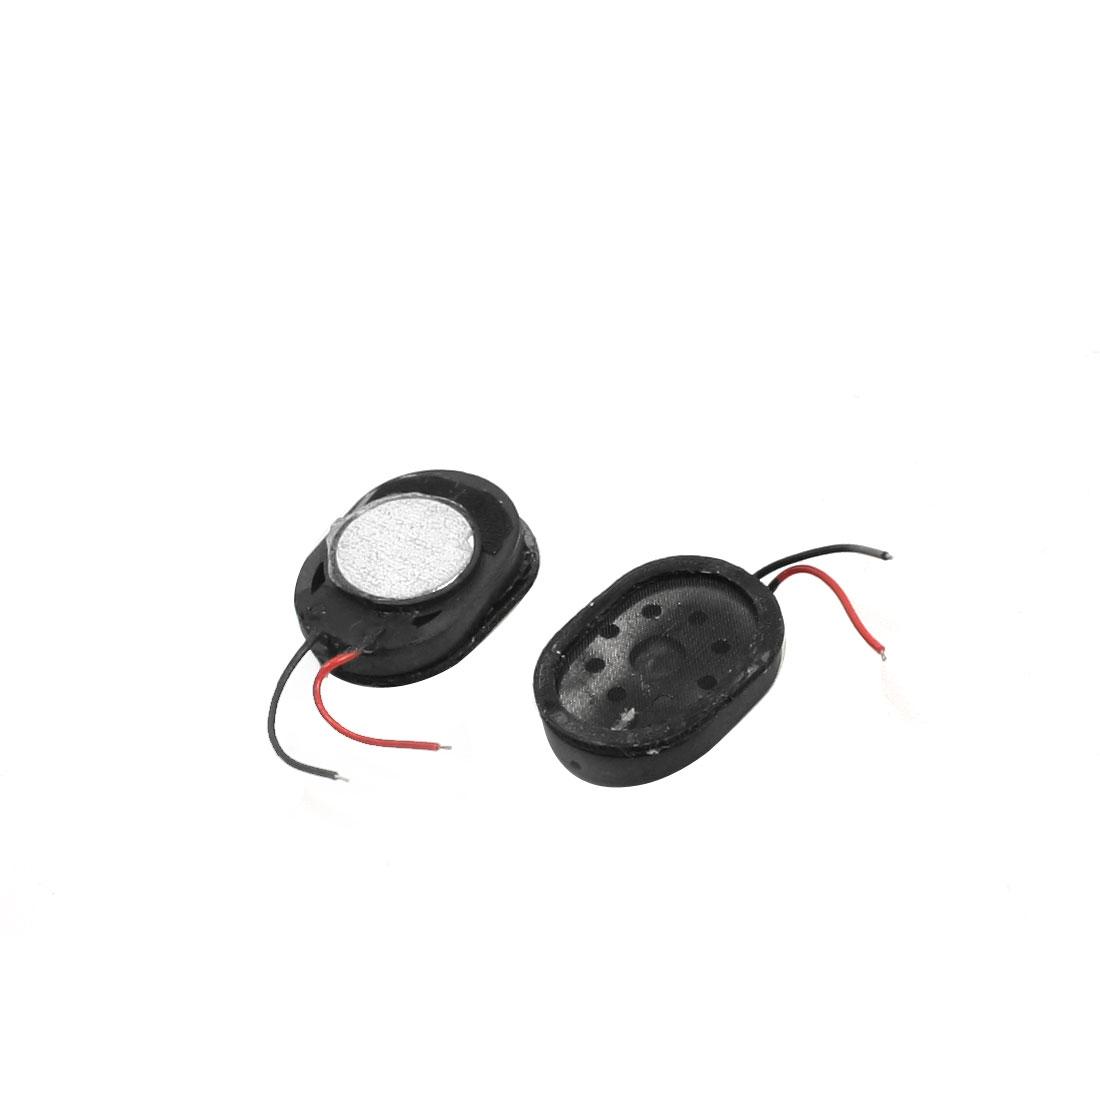 2Pcs 1W 8 Ohm 2-Wired Oval Shaped Plastic Shell Phone Tablet PC Magnet Audio Speaker Loudspeaker Amplifier 17mm x 12mm